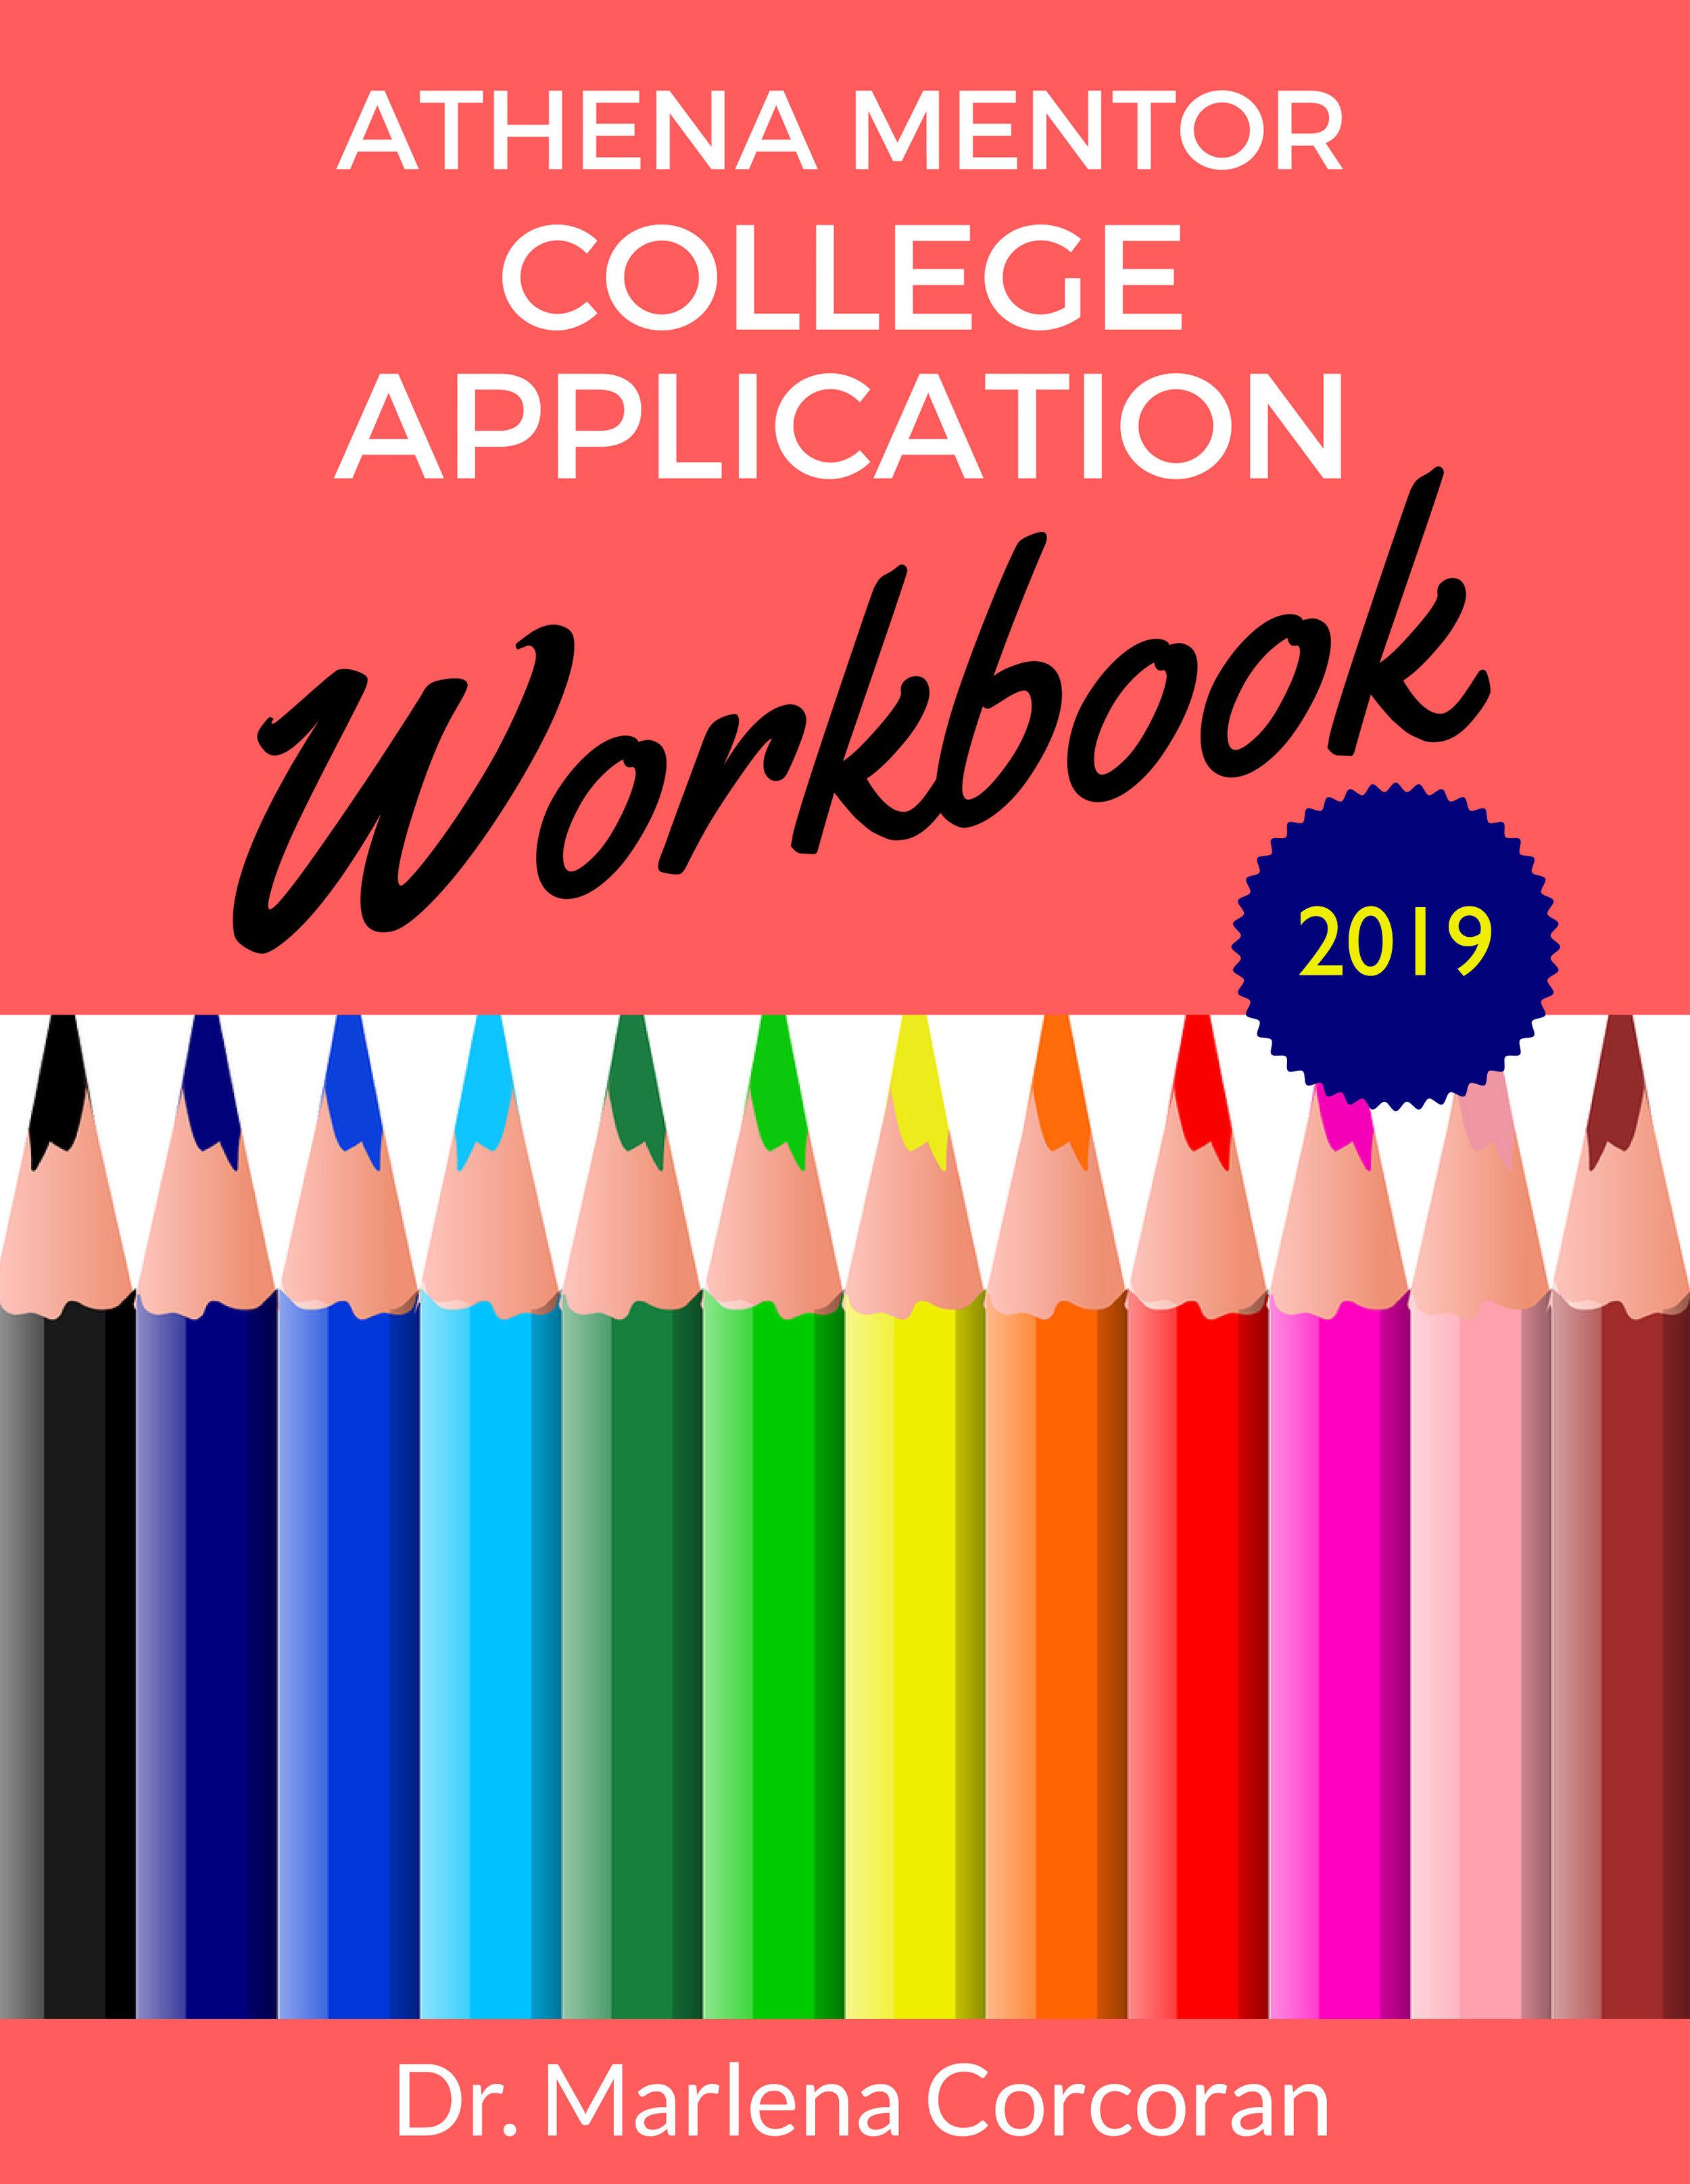 College Application Workbook Cover-2019.jpg